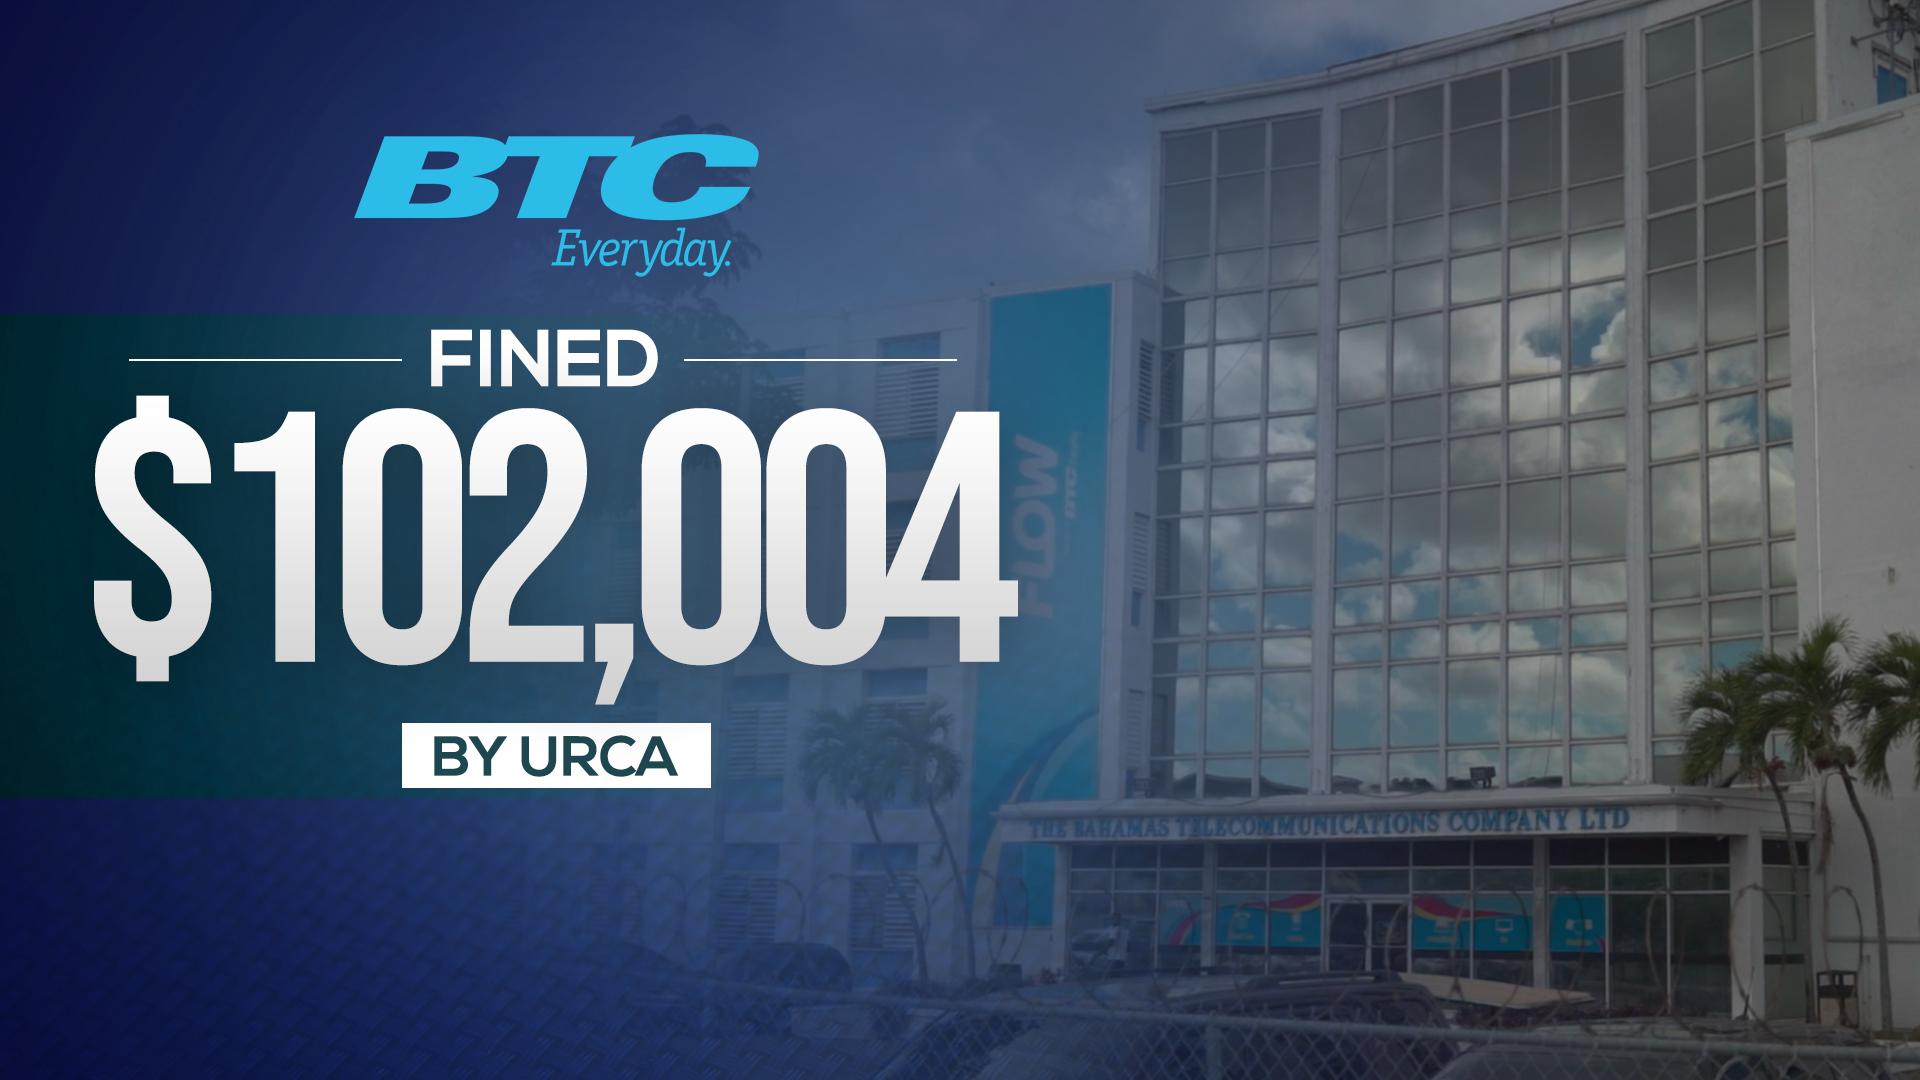 BTC fined $102,004 by URCA